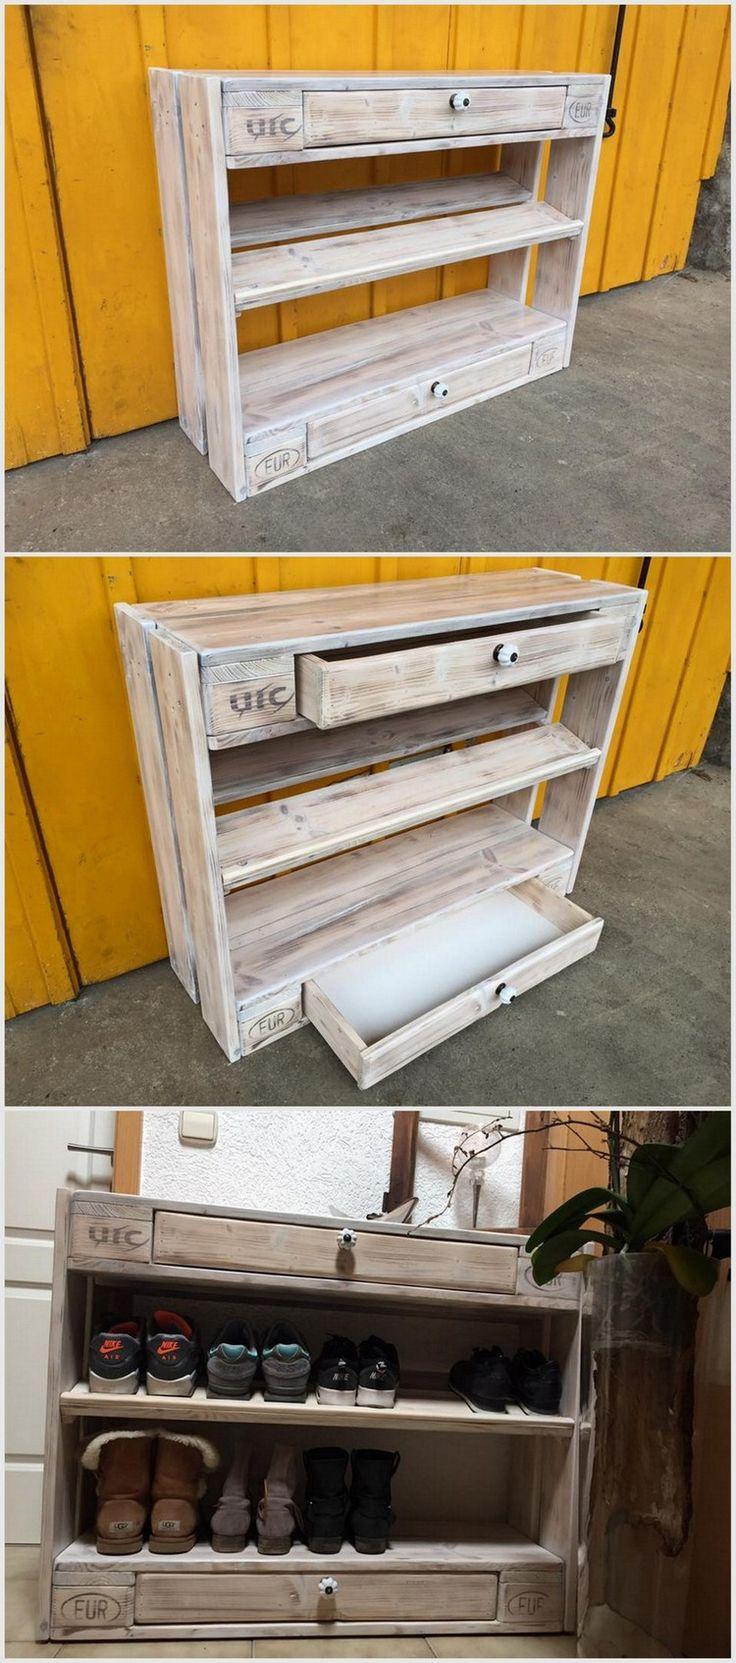 1143 best old pallets images on pinterest pallet ideas for Old wood pallets ideas